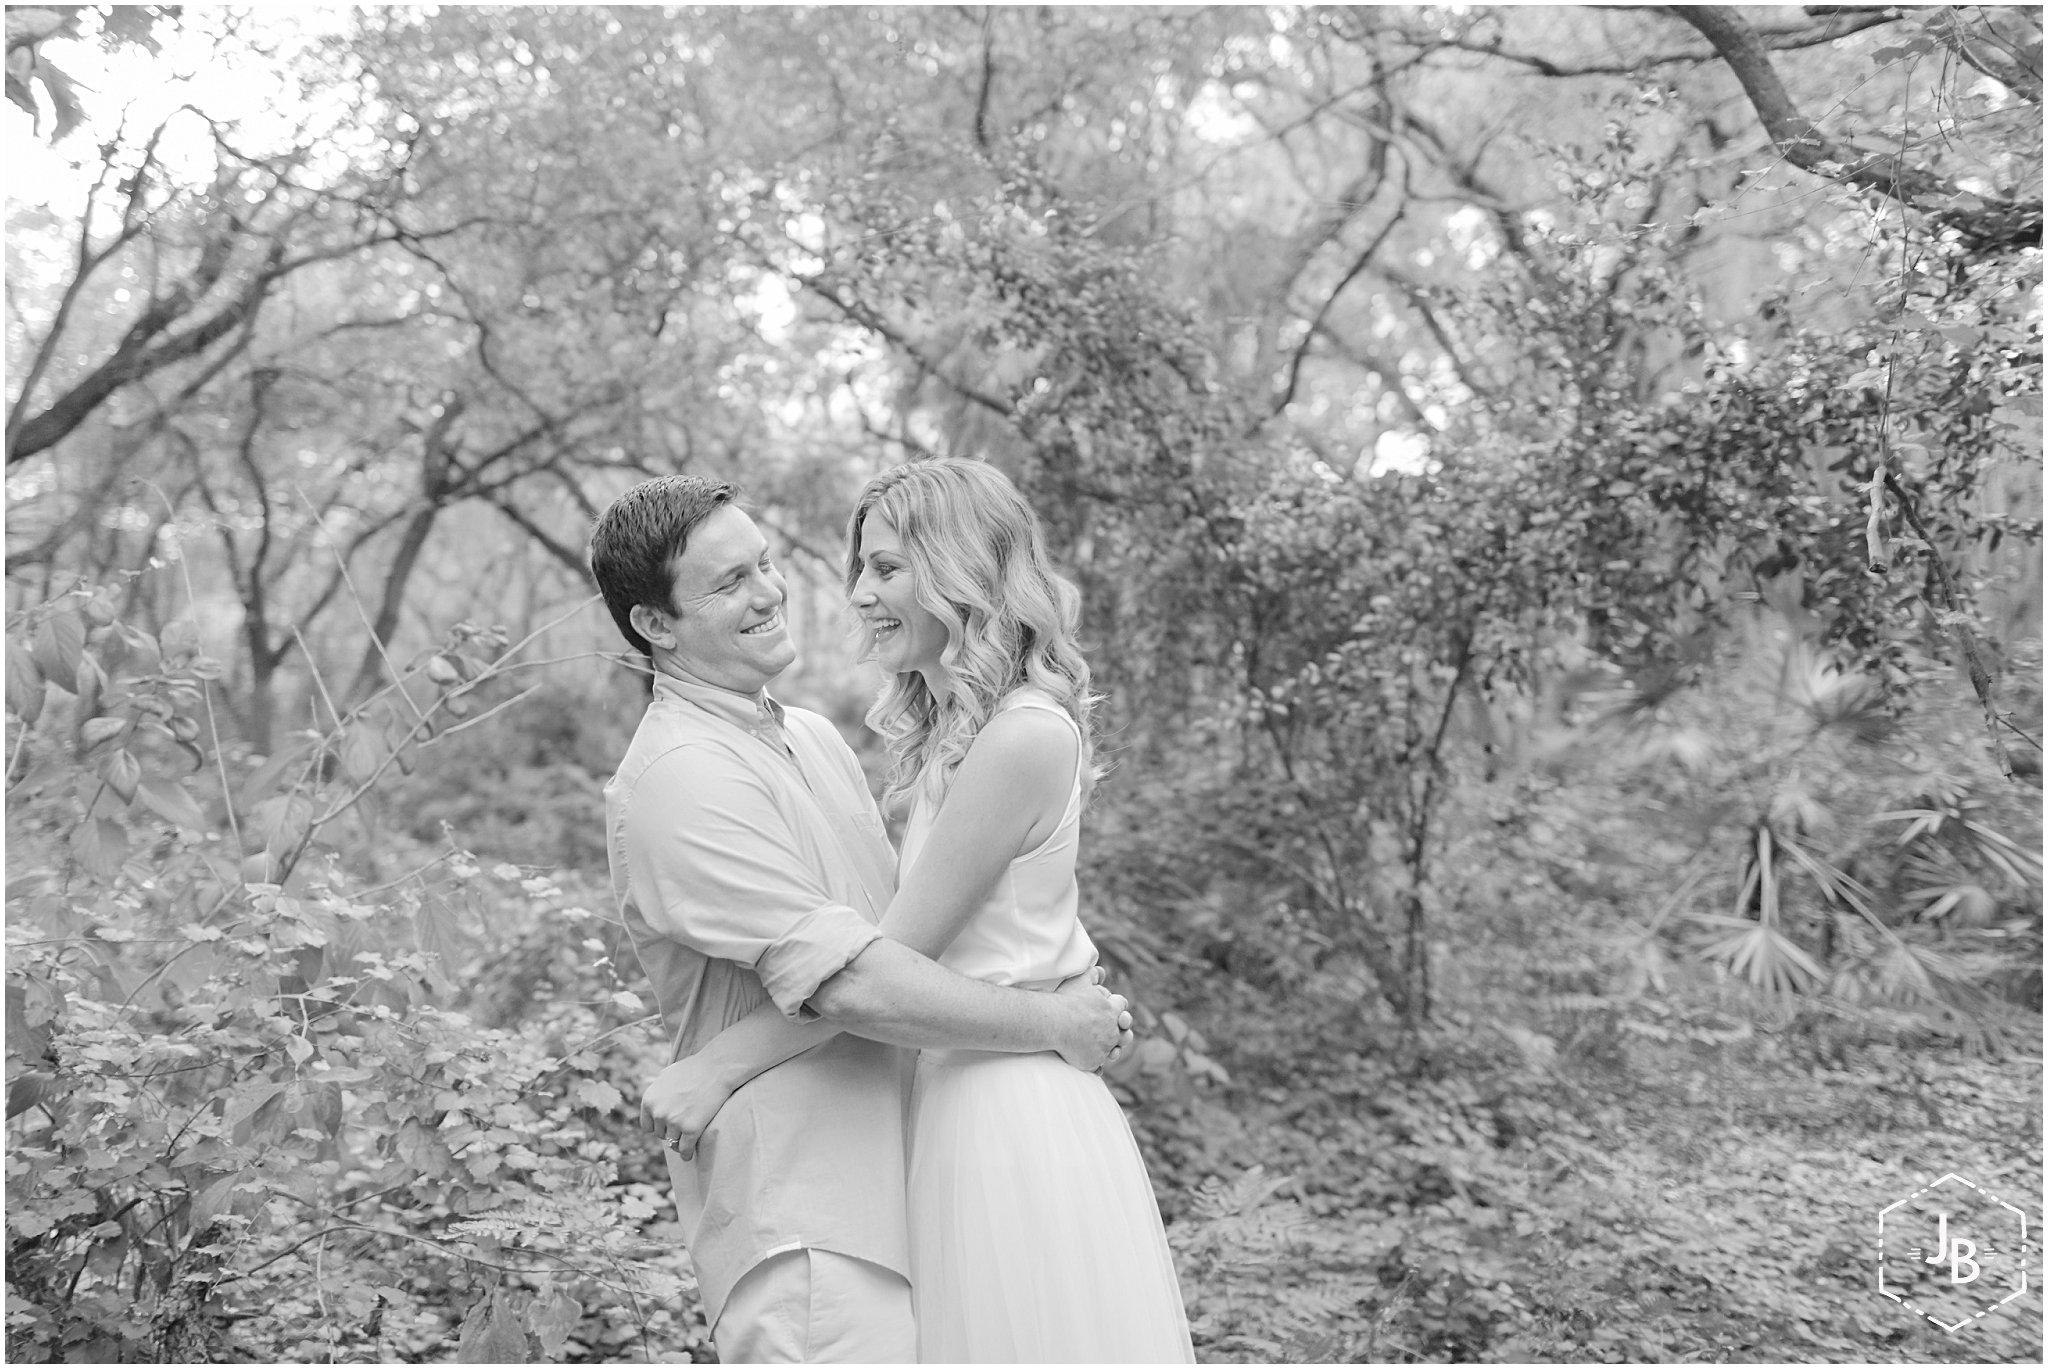 WeddingandEngagementFloridaPhotographer_0022.jpg